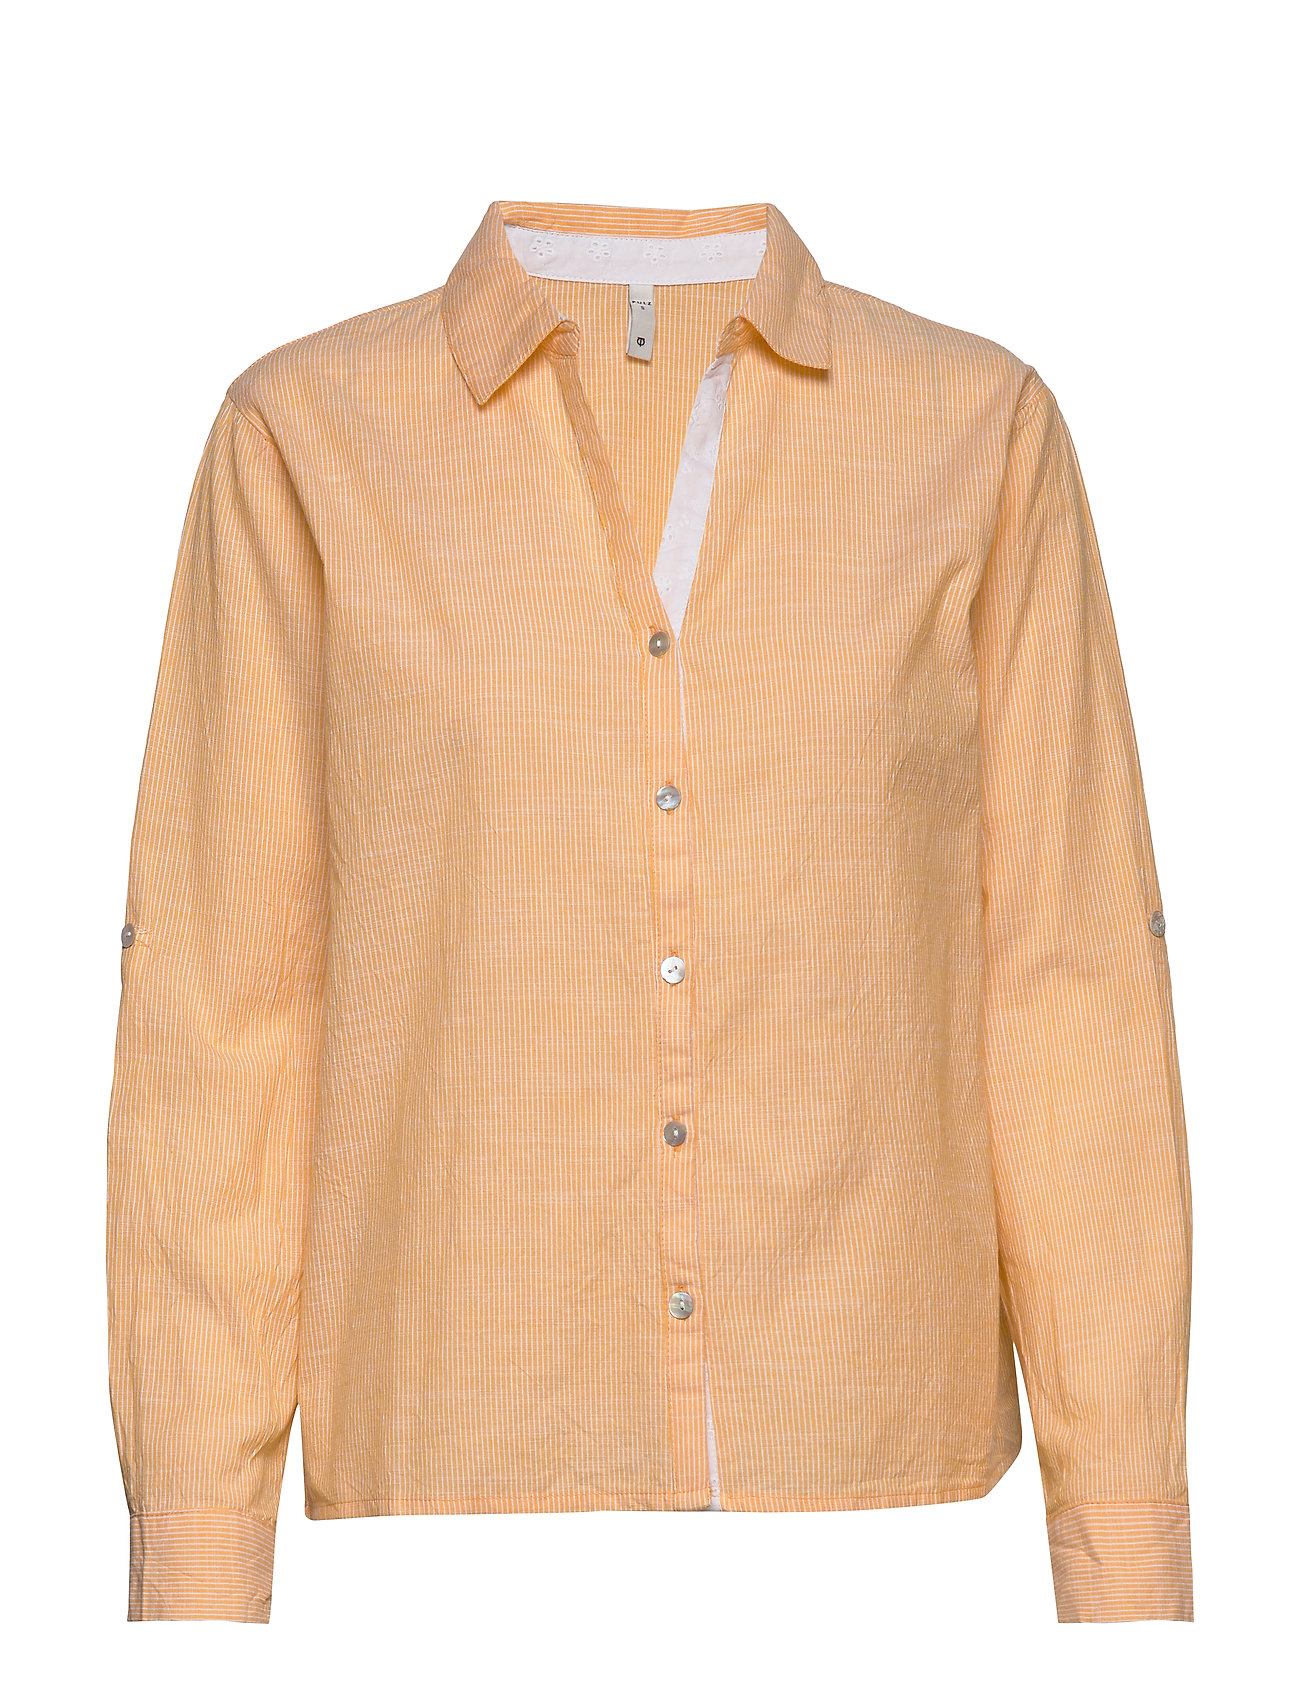 Pulz Jeans PZLONE Shirt - ARTISAN'S GOLD